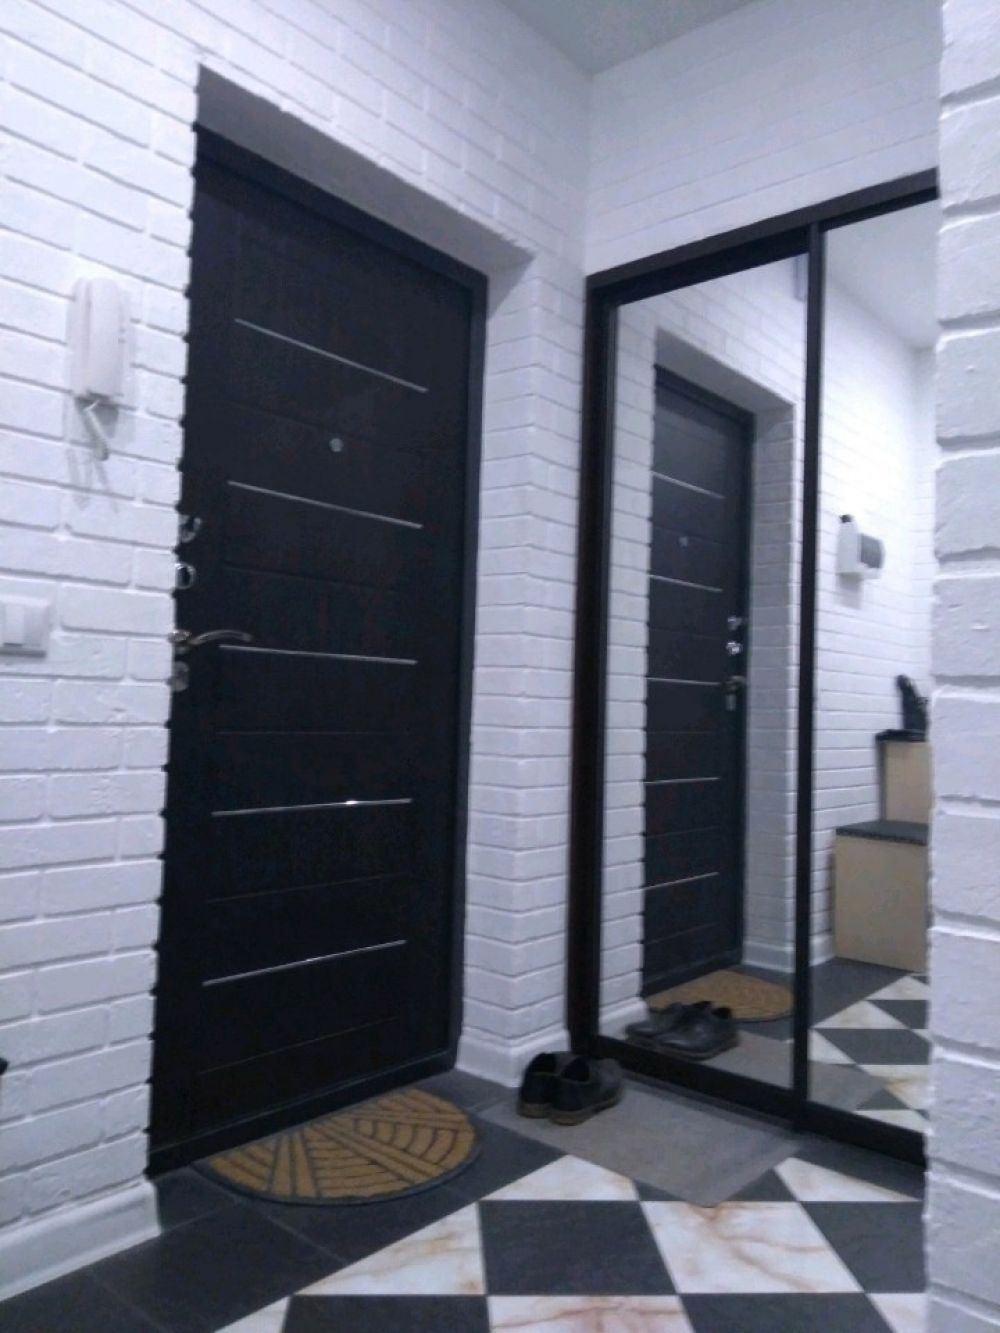 1-к квартира, Щелково, микрорайон Богородский, 3, фото 2